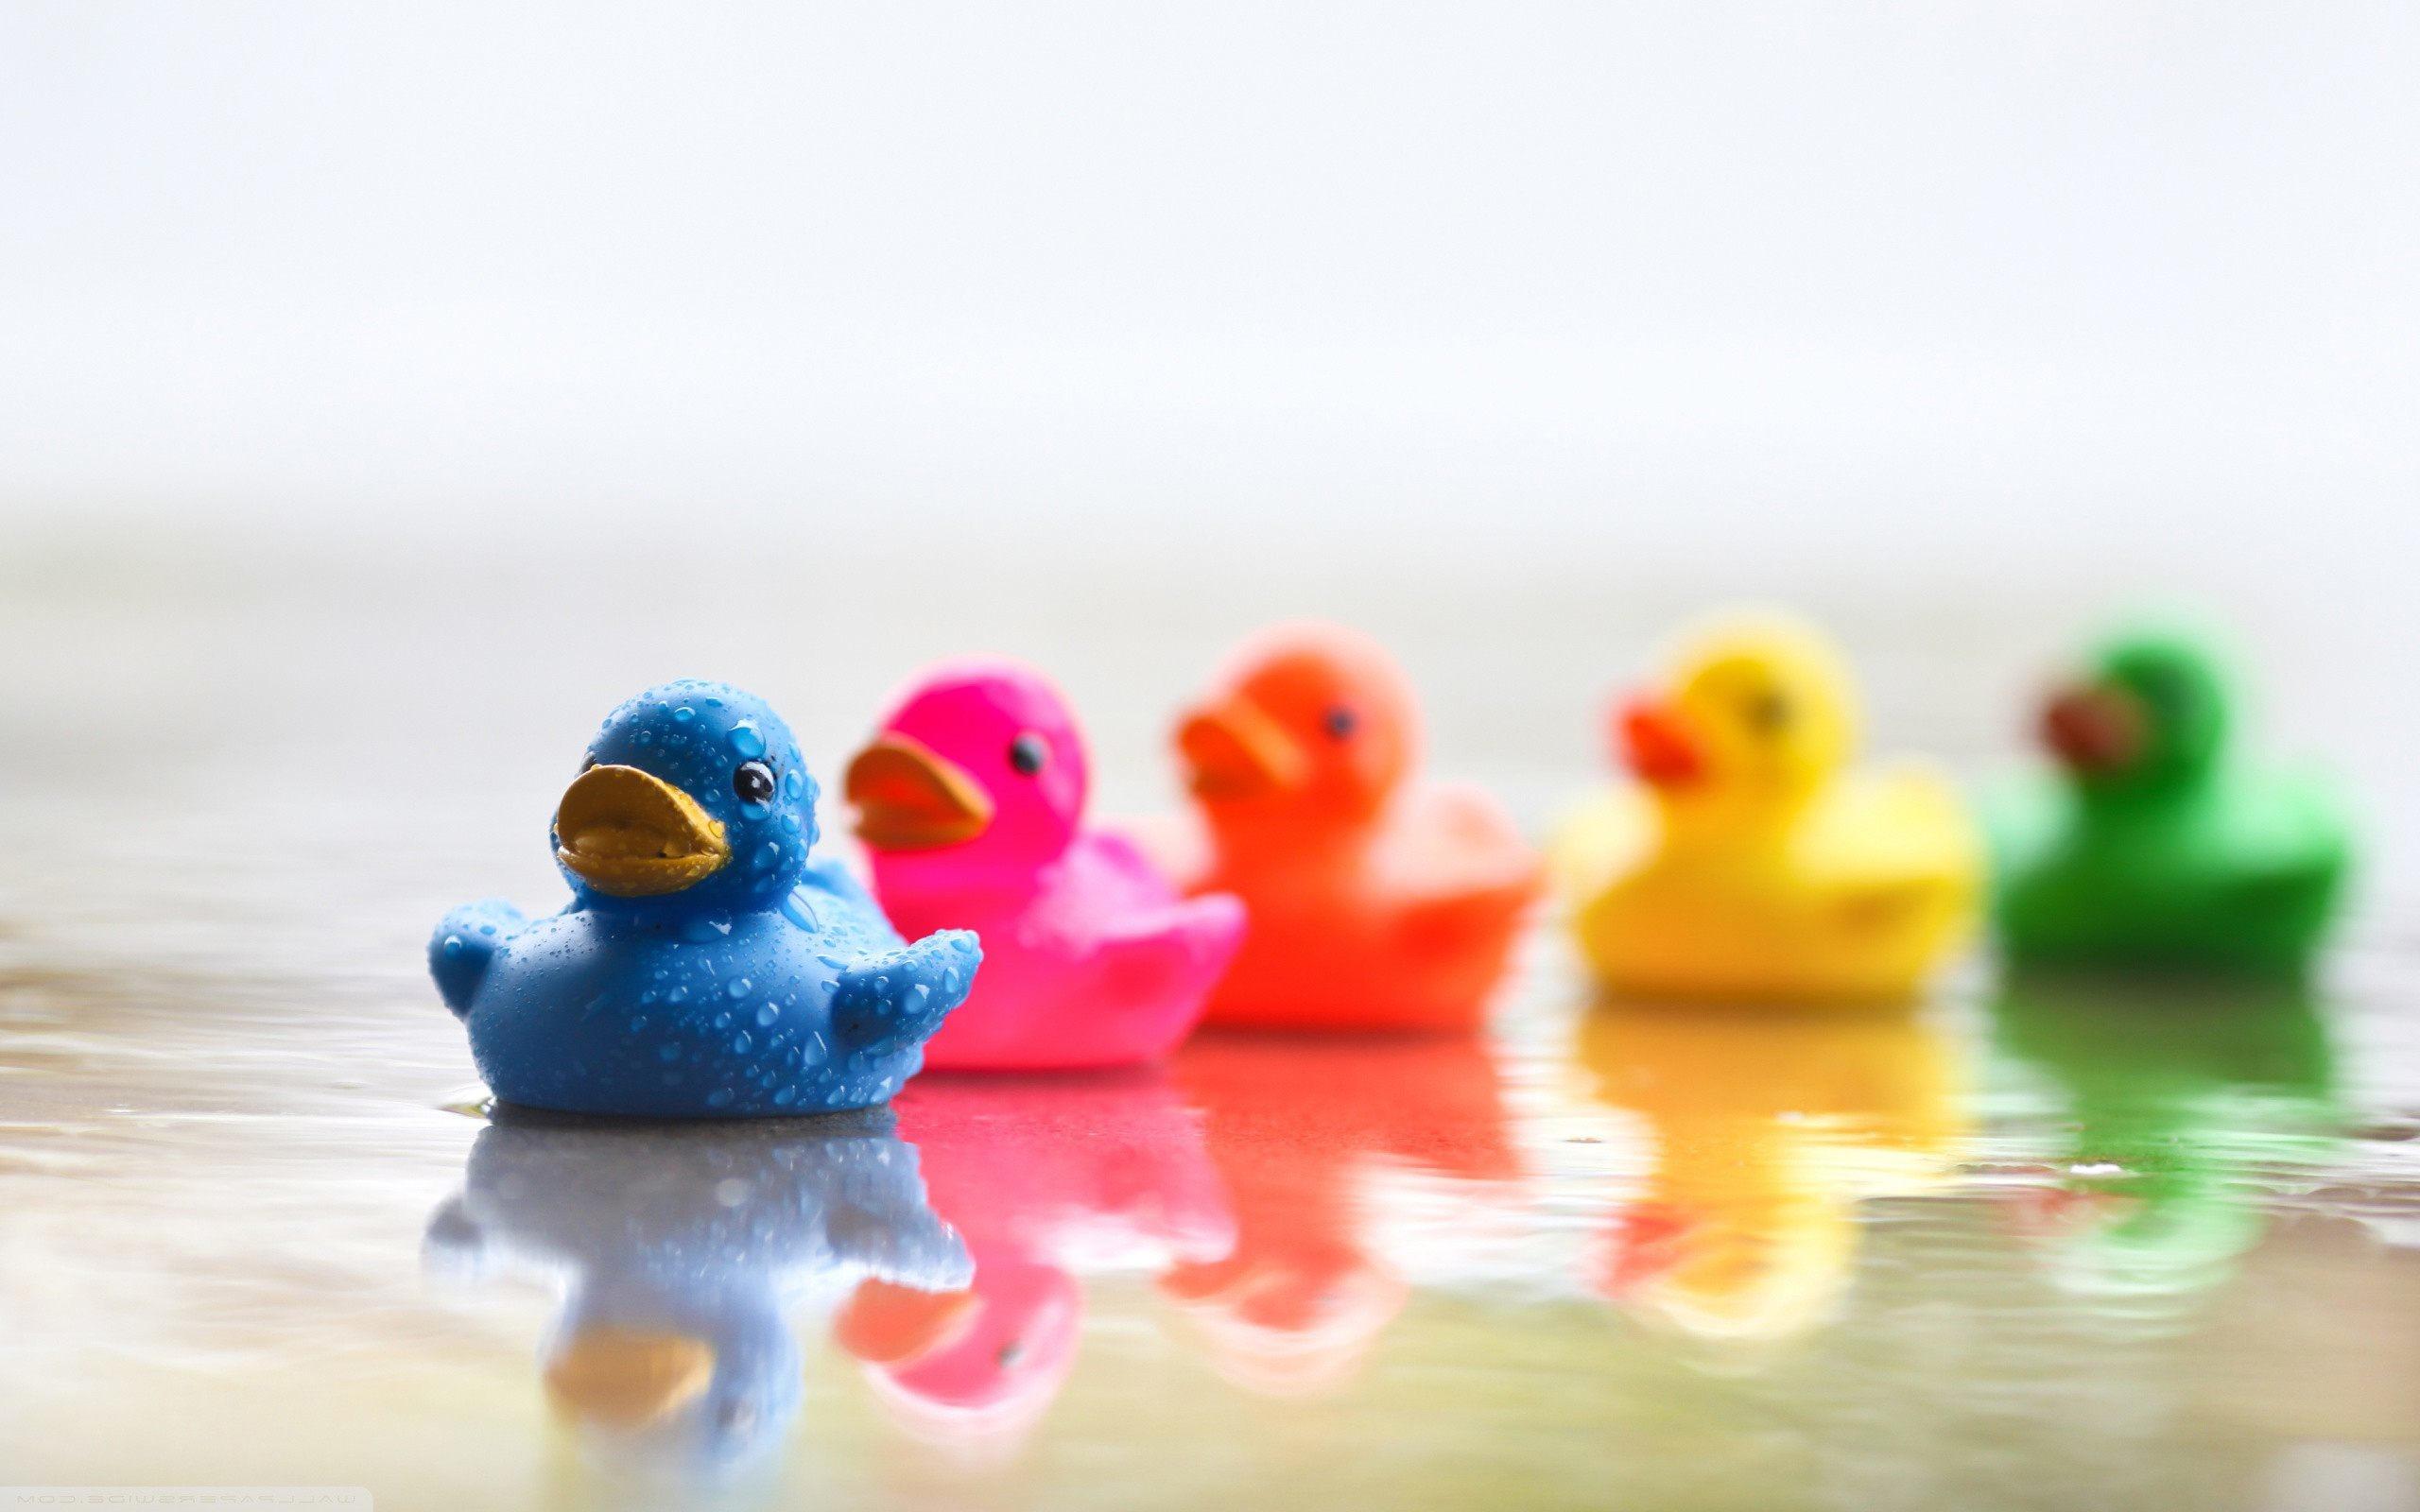 Rubber Ducks HD Wallpaper